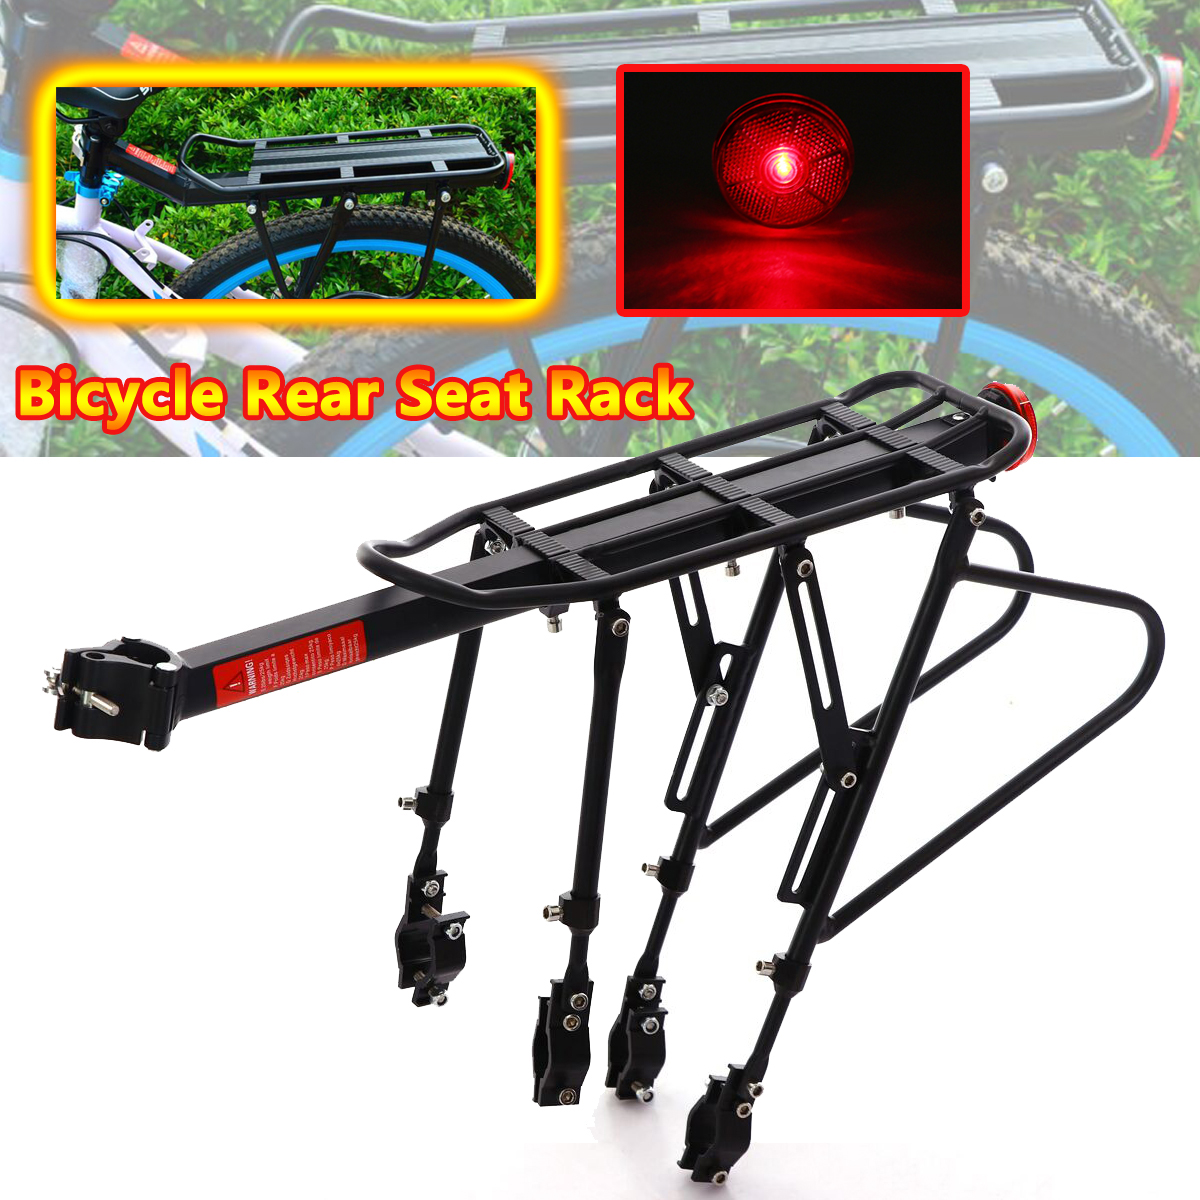 Heavy Duty Bike Bicycle Pannier Rear Rack Carrier Bracket Luggage Max Load